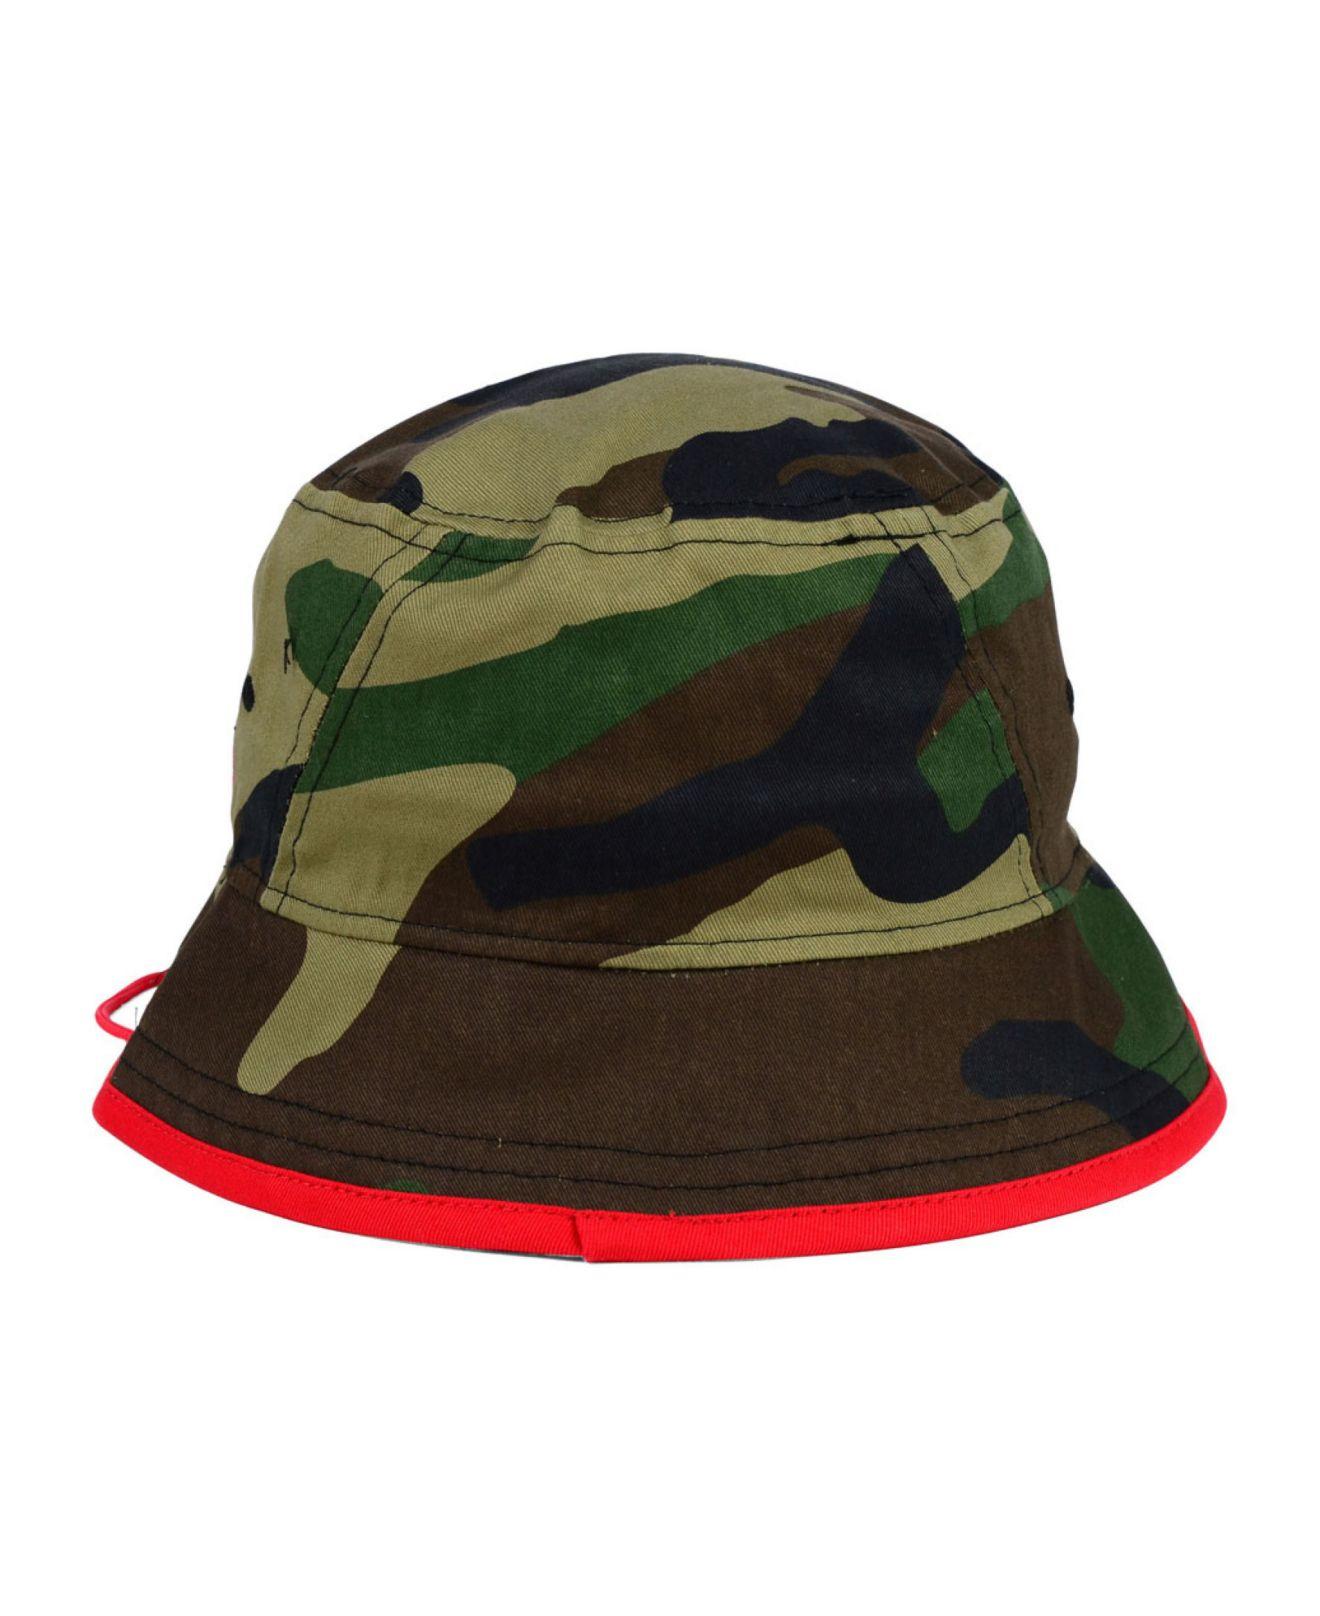 64f858f0 ... cheap lyst ktz buffalo bills camo pop bucket hat for men a491f ec25f